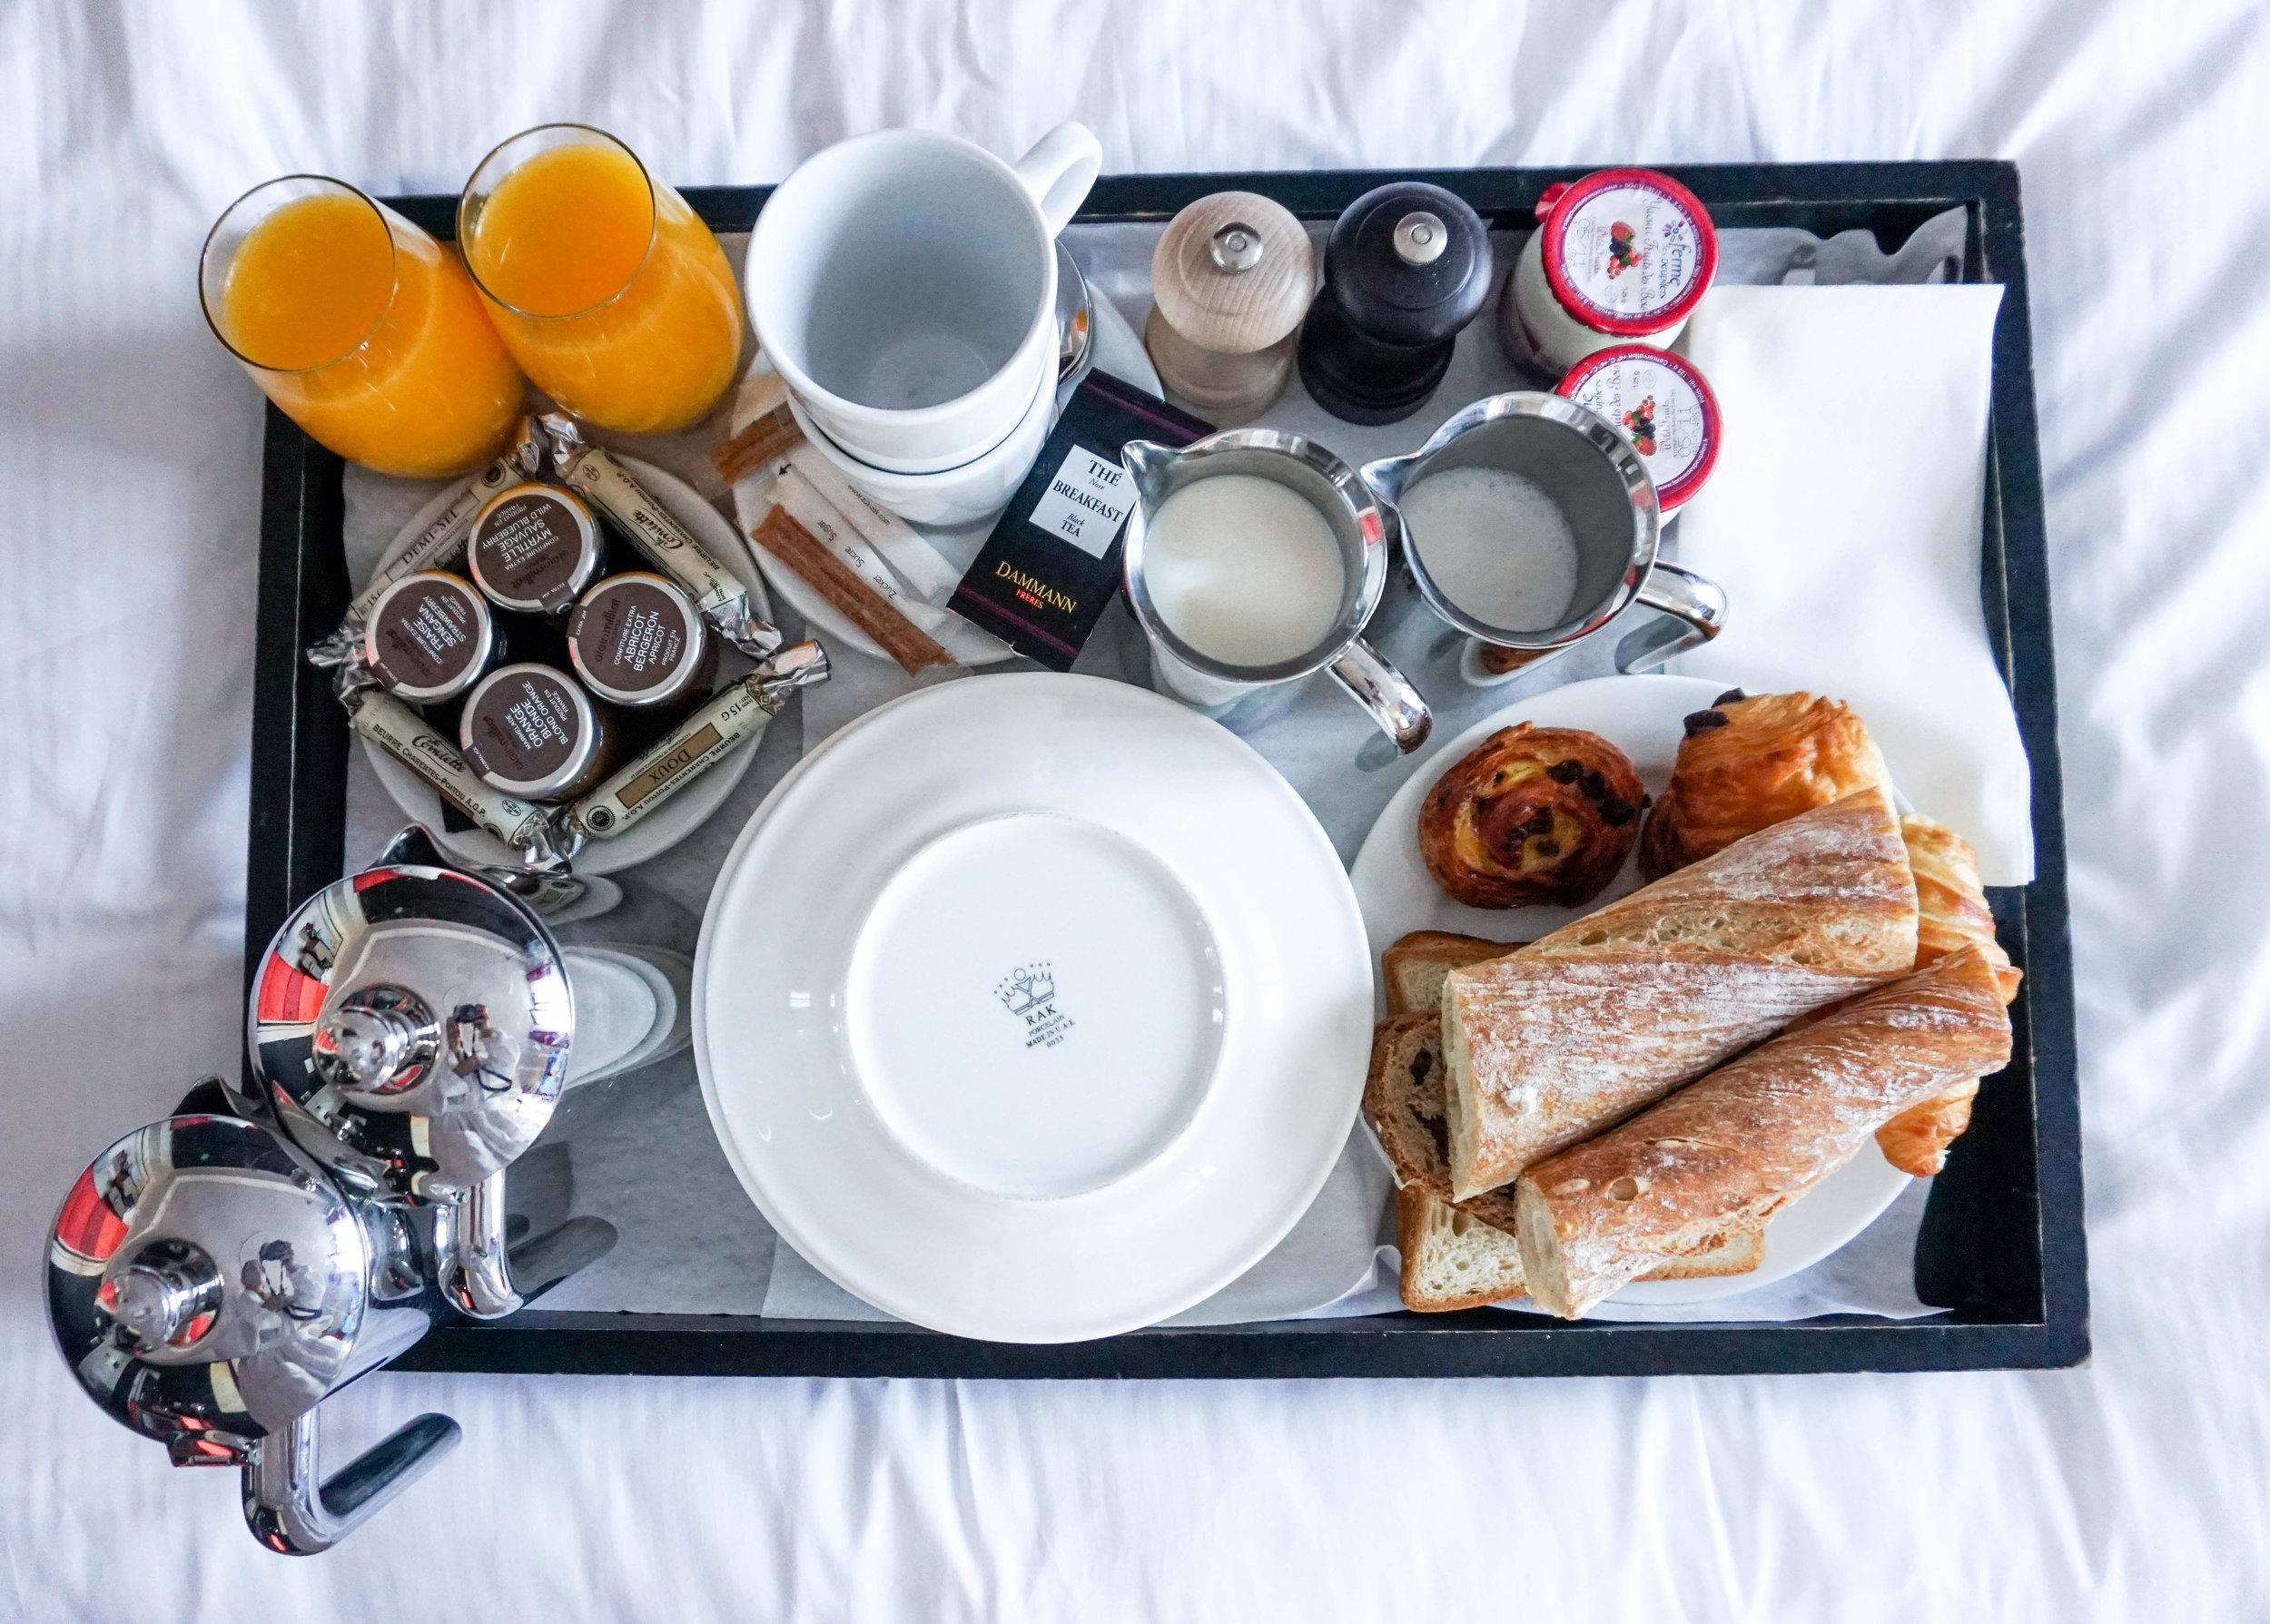 Paris-Terrass Hotel-room service